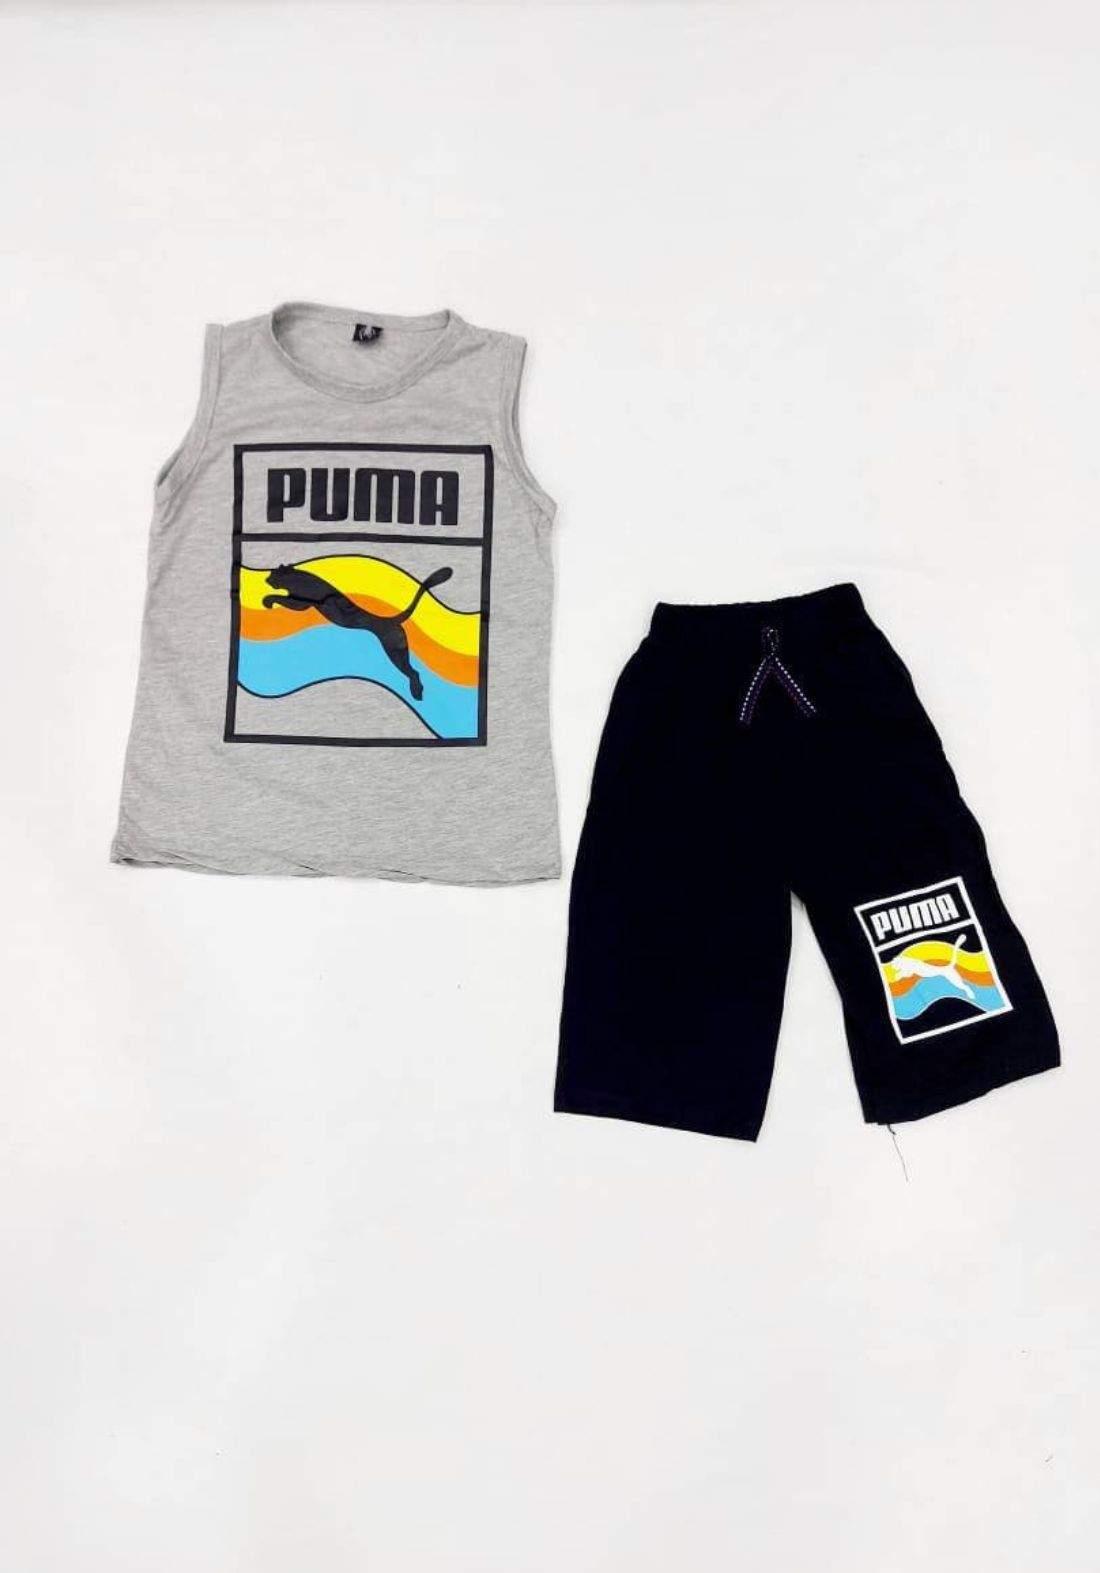 tracksuit for boys grey  (t-shirt +short) ( تراكسوت ولادي رصاصي   (برمودهوكيمونه